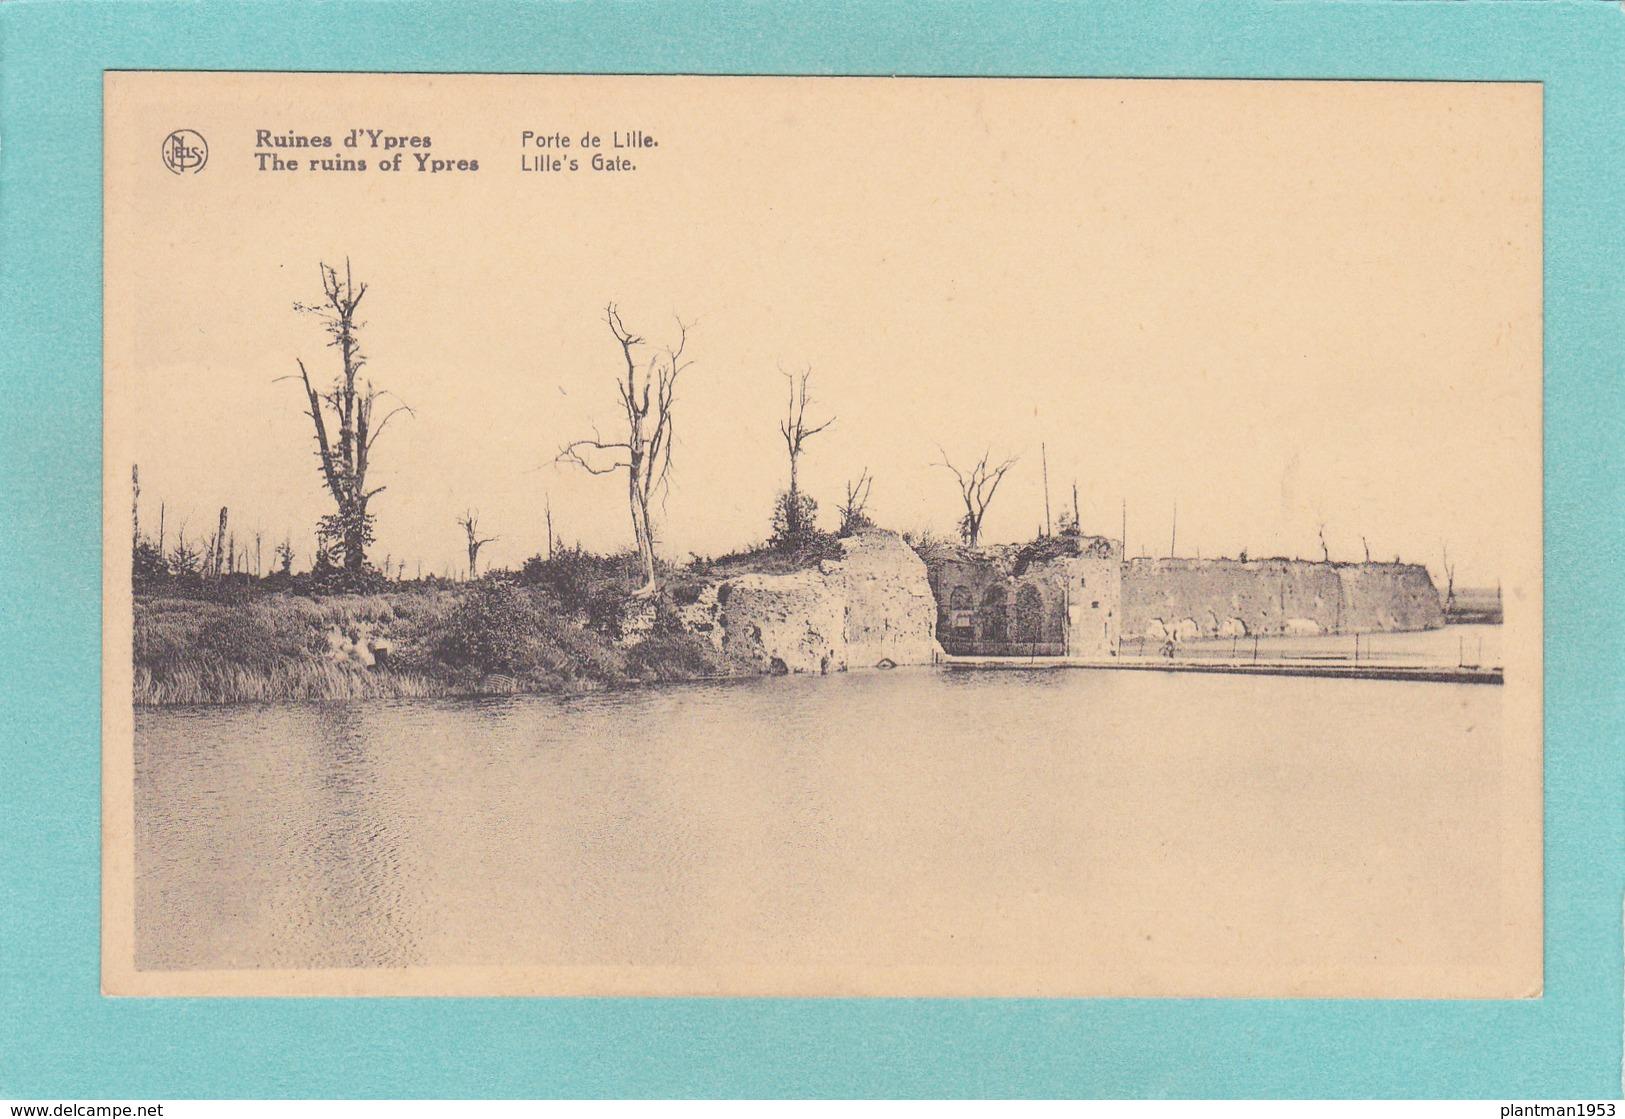 Old Postcard Of Ruines D`Vpres,Ieper,Flemish Province Of West Flanders, Belgium.,R33. - Ieper